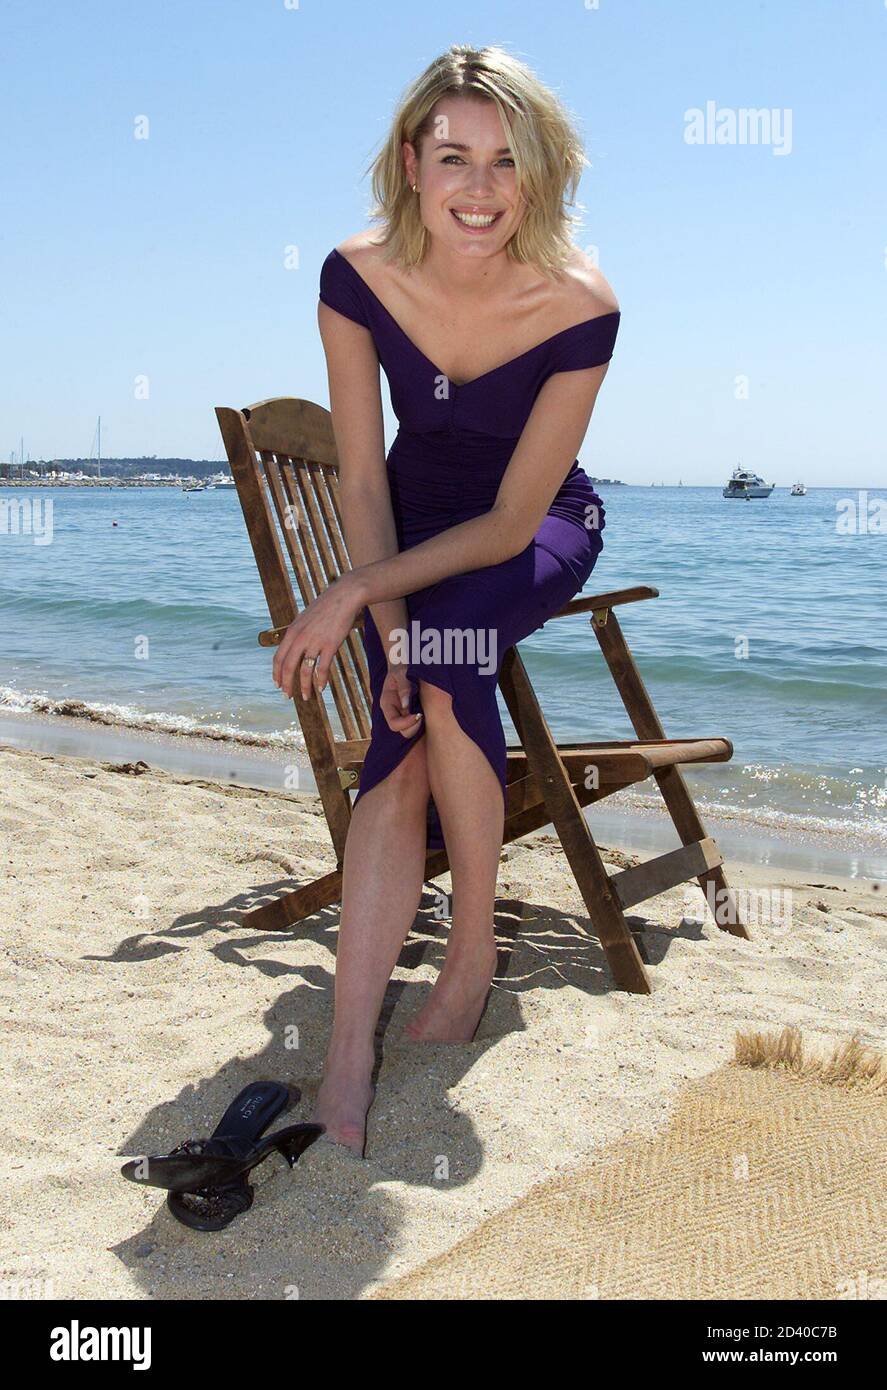 Rebecca romijn beach